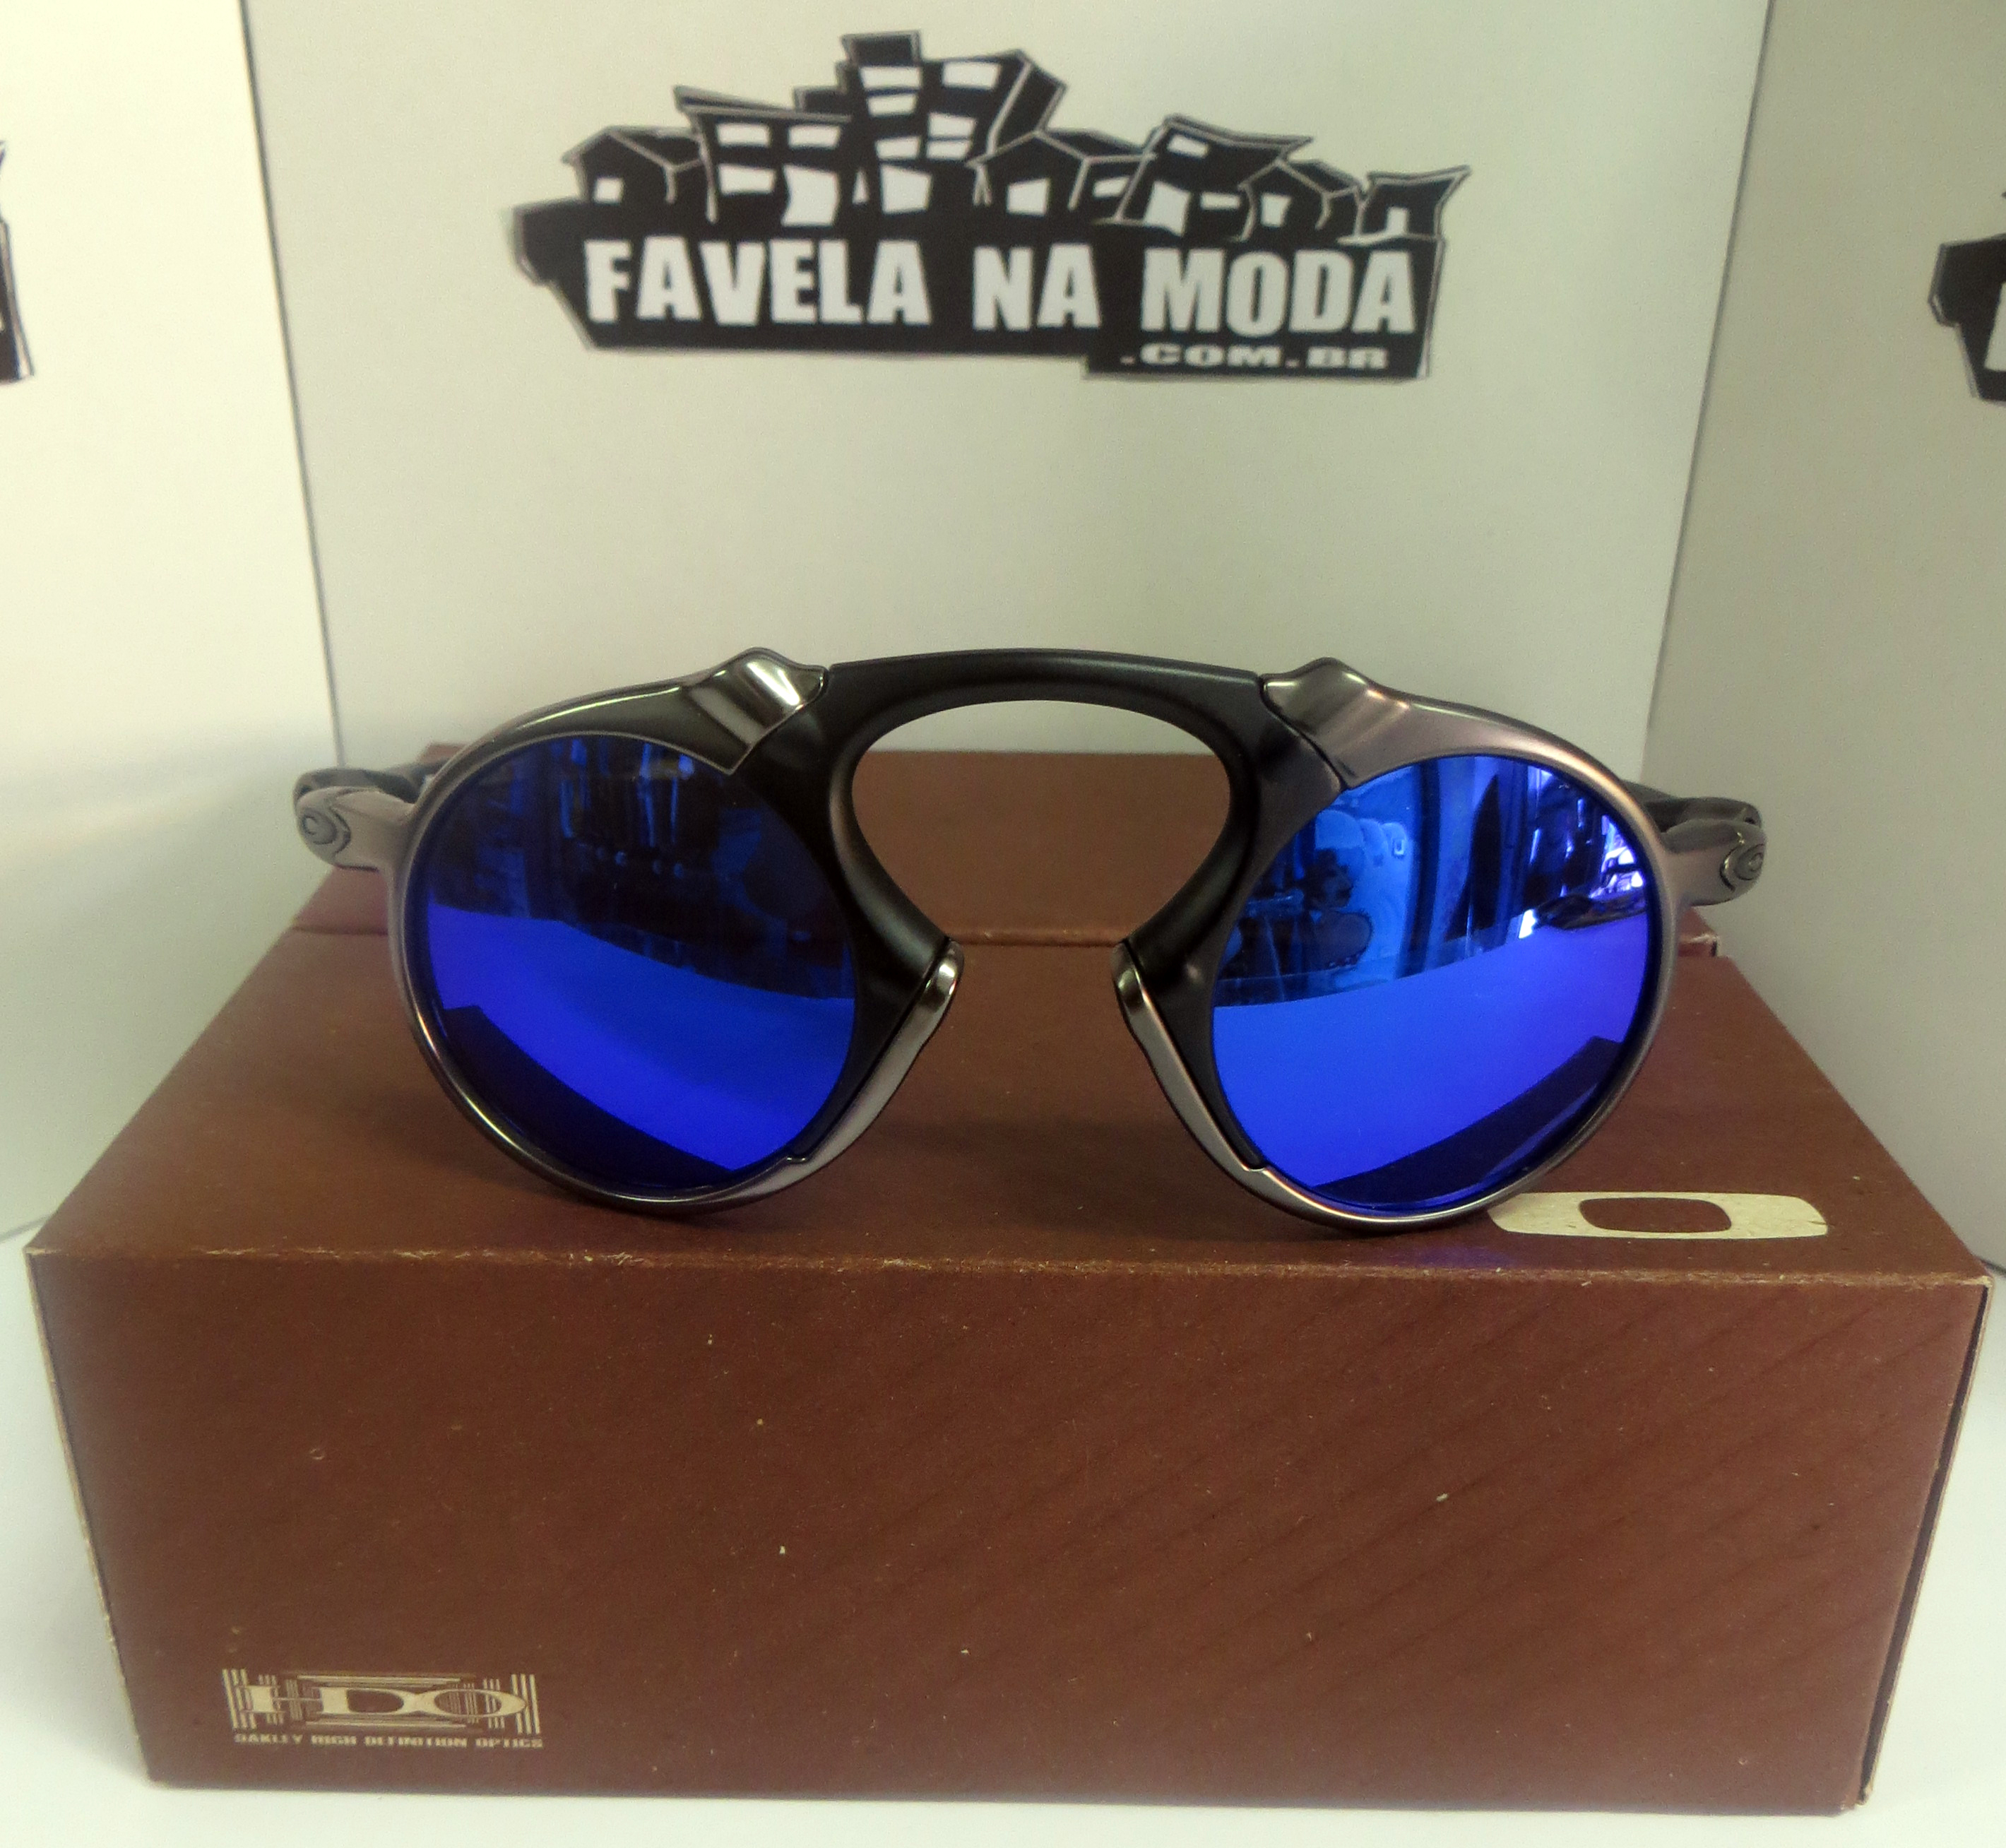 915849cc5 Óculos - Óculos Oakley - Madman - Favela na Moda Imports